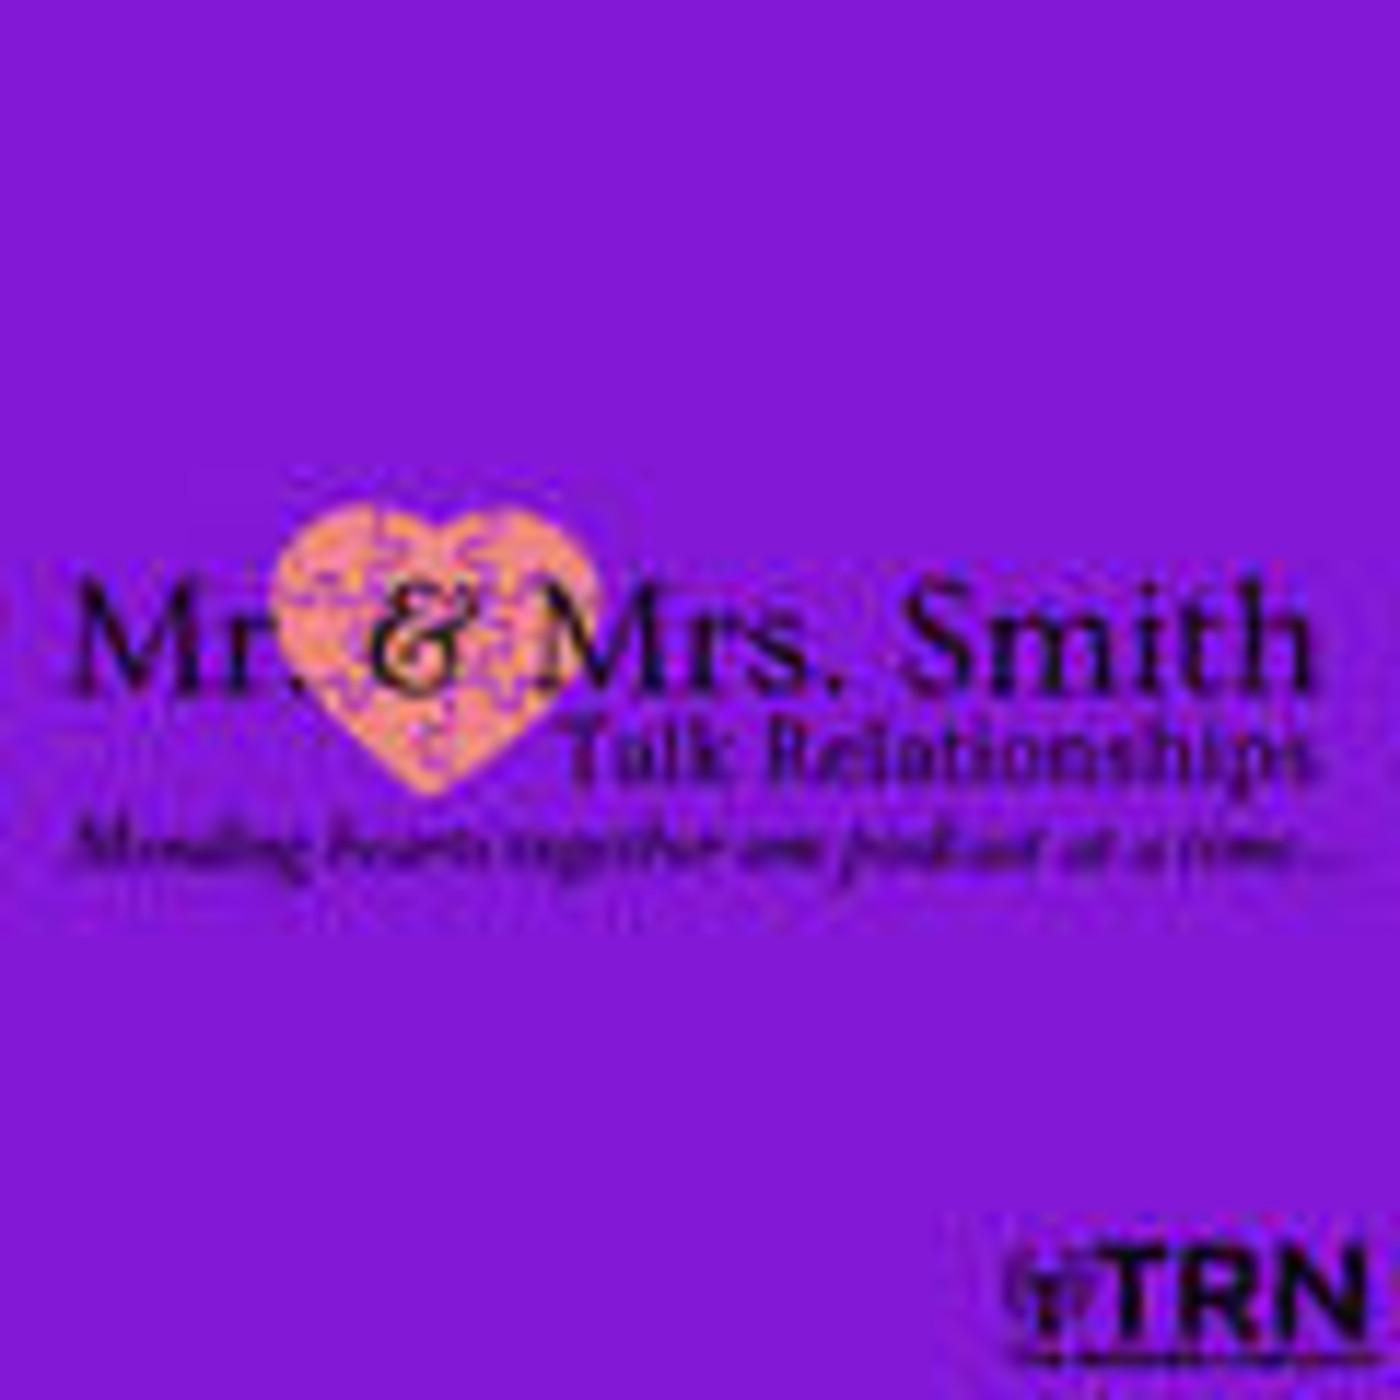 Mr. & Mrs. Smith Talk Rela